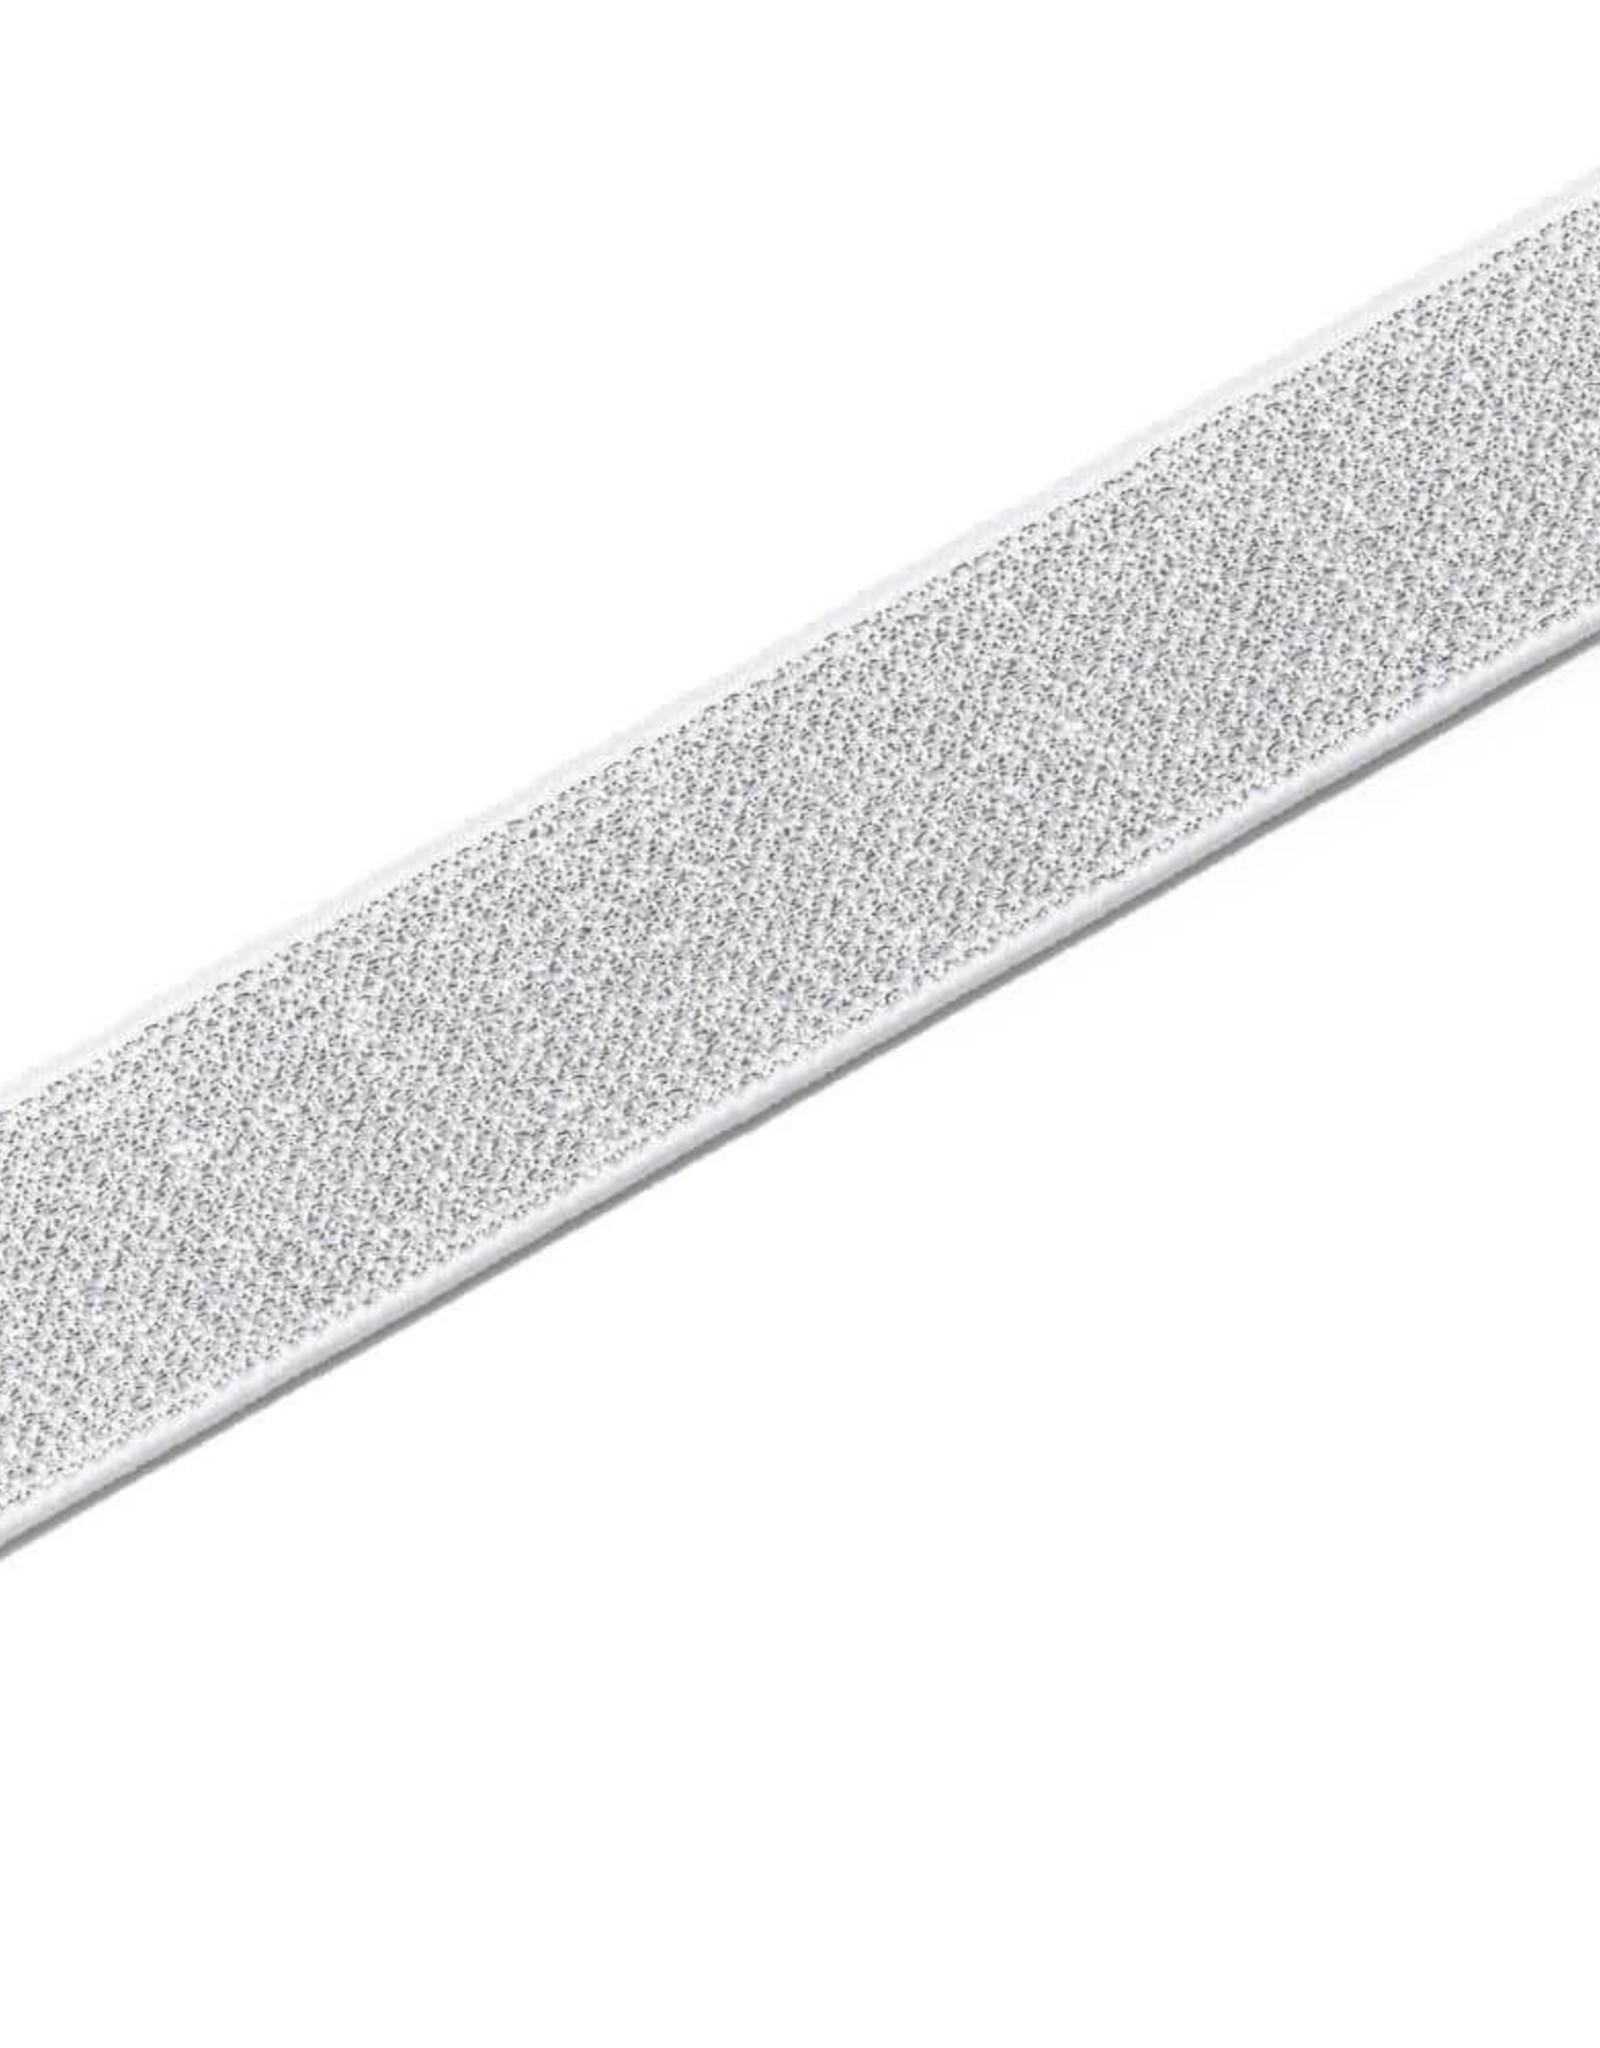 Prym Prym ELASTIEK COLOR WIT-ZILVER 25mm